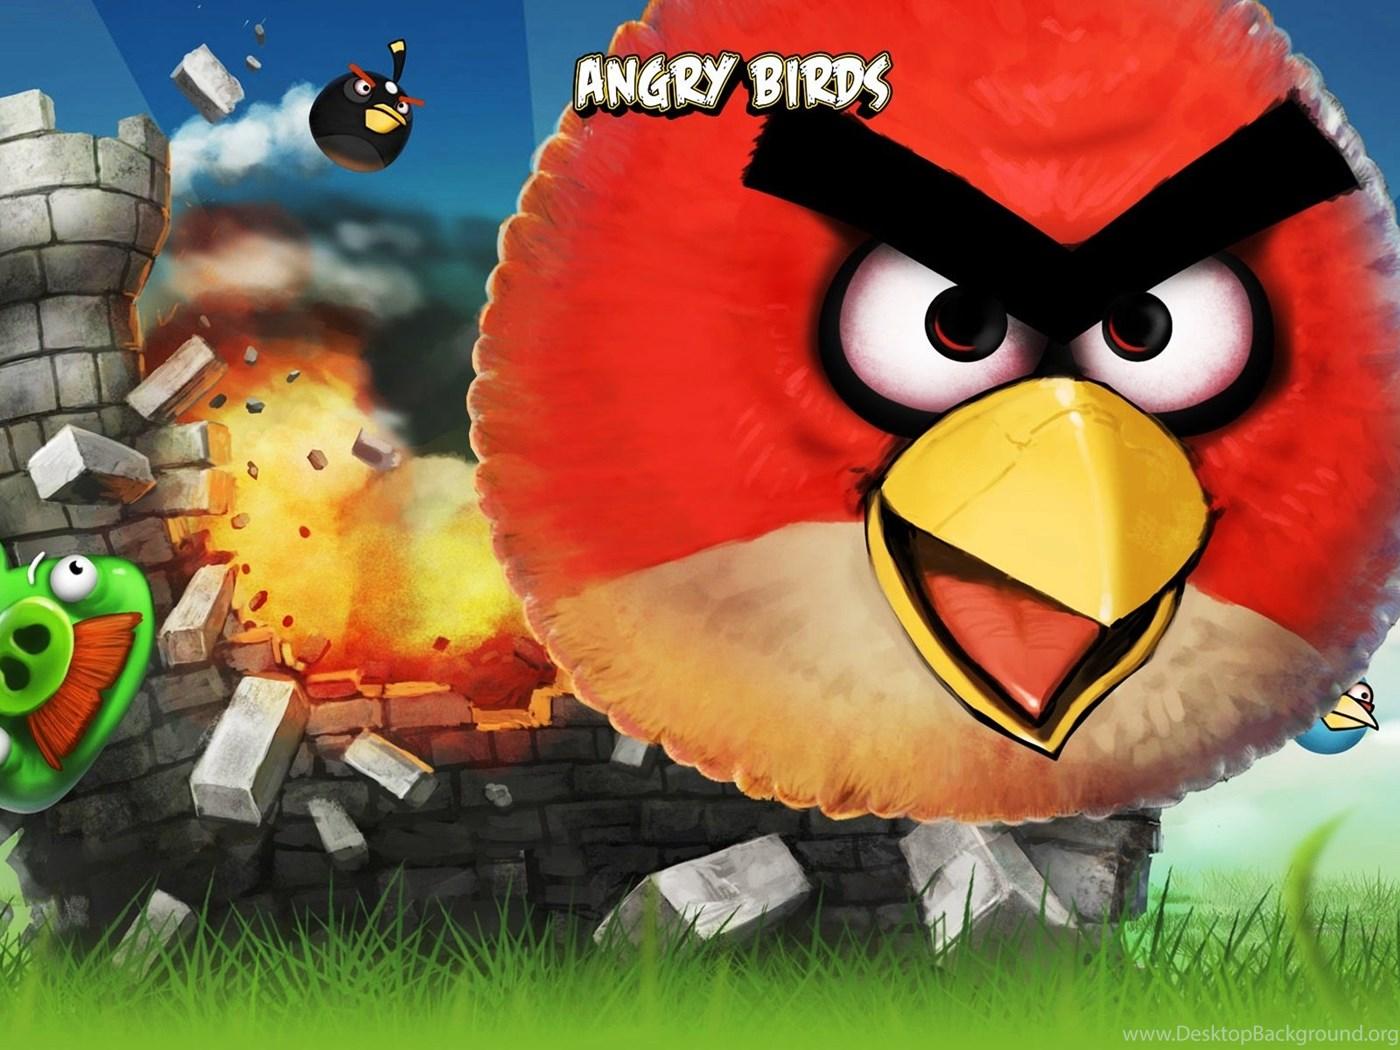 Green angry bird wallpaper